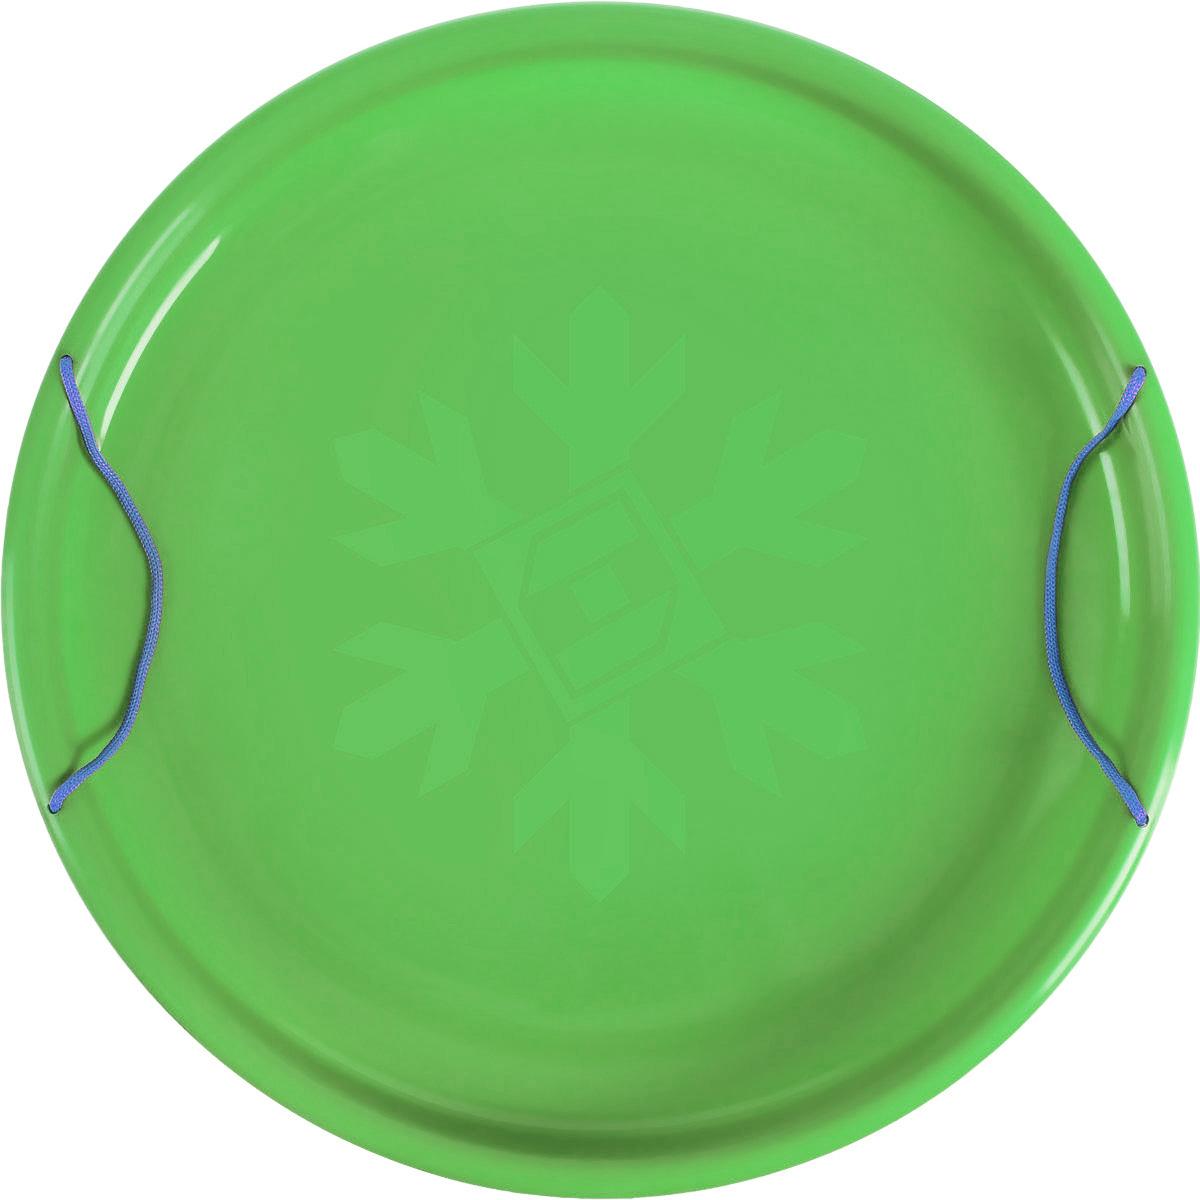 Санки-ледянки Престиж Экстрим, цвет: зеленый, диаметр 53 см